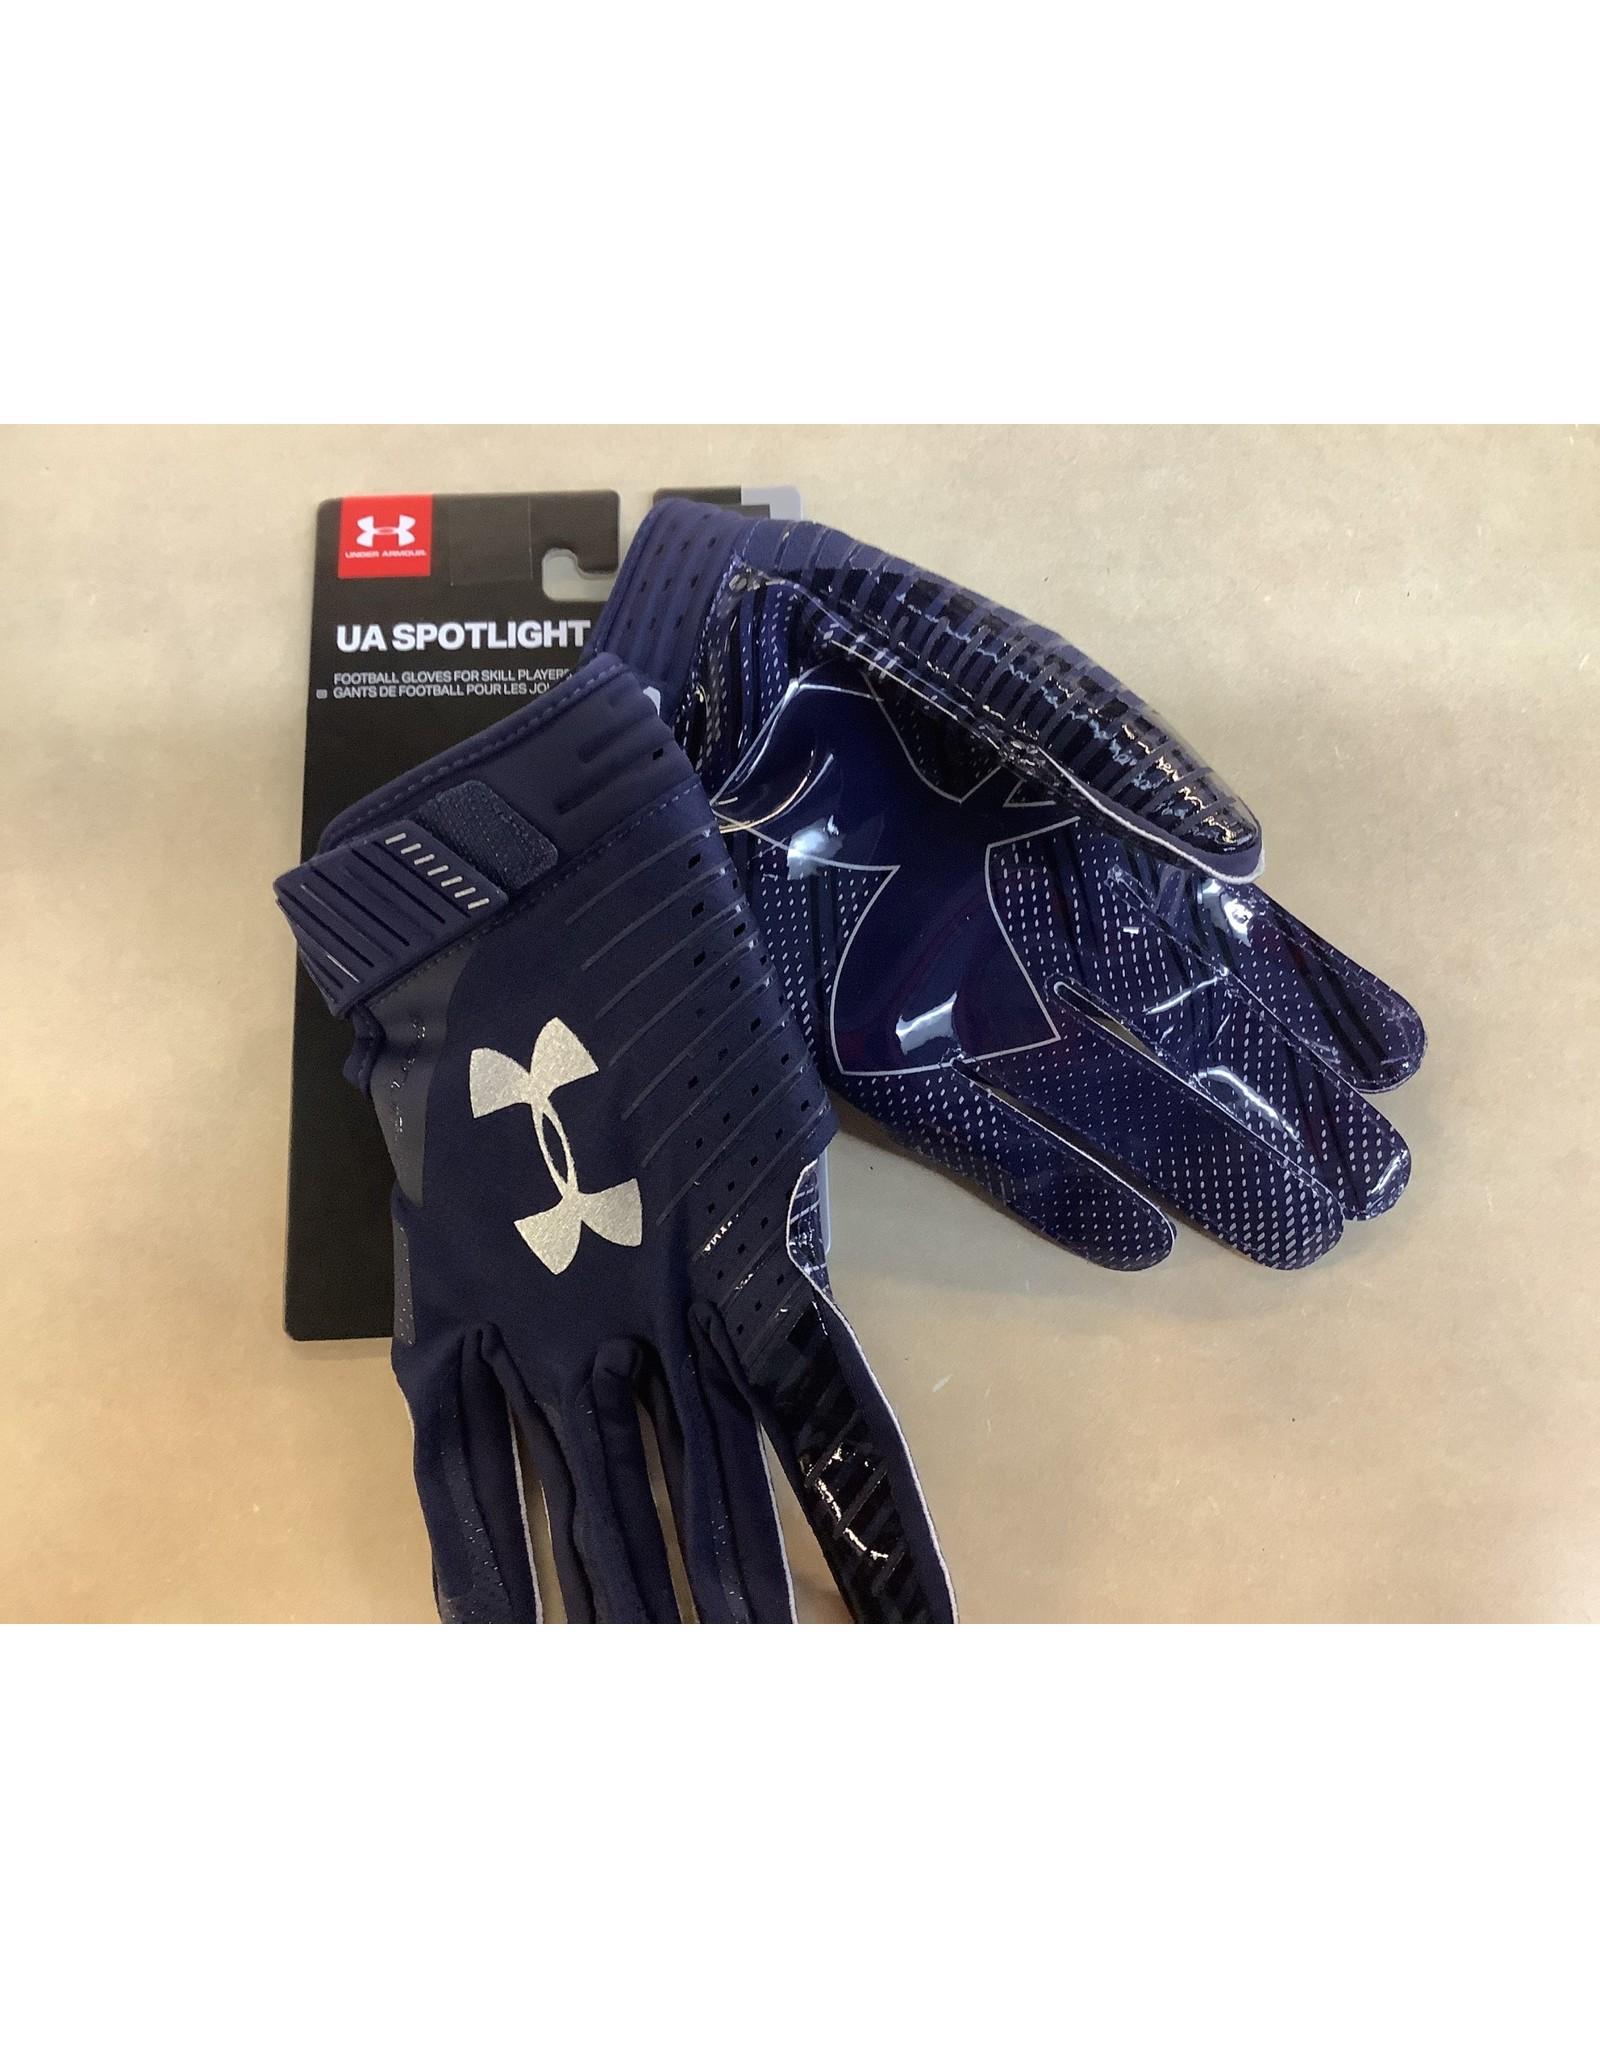 Under Armour UA Spotlight Football Gloves